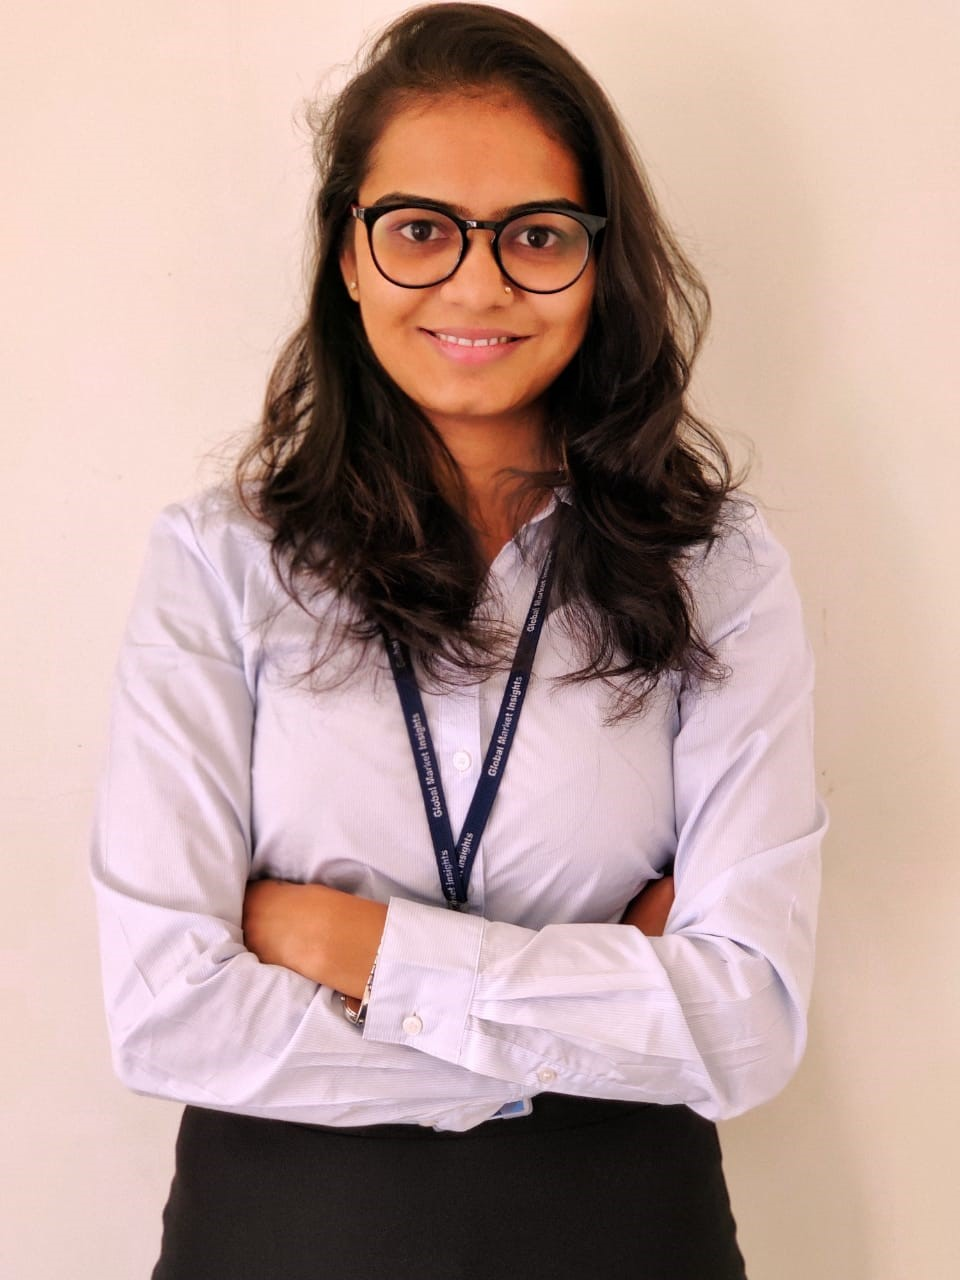 Pranali Mehta